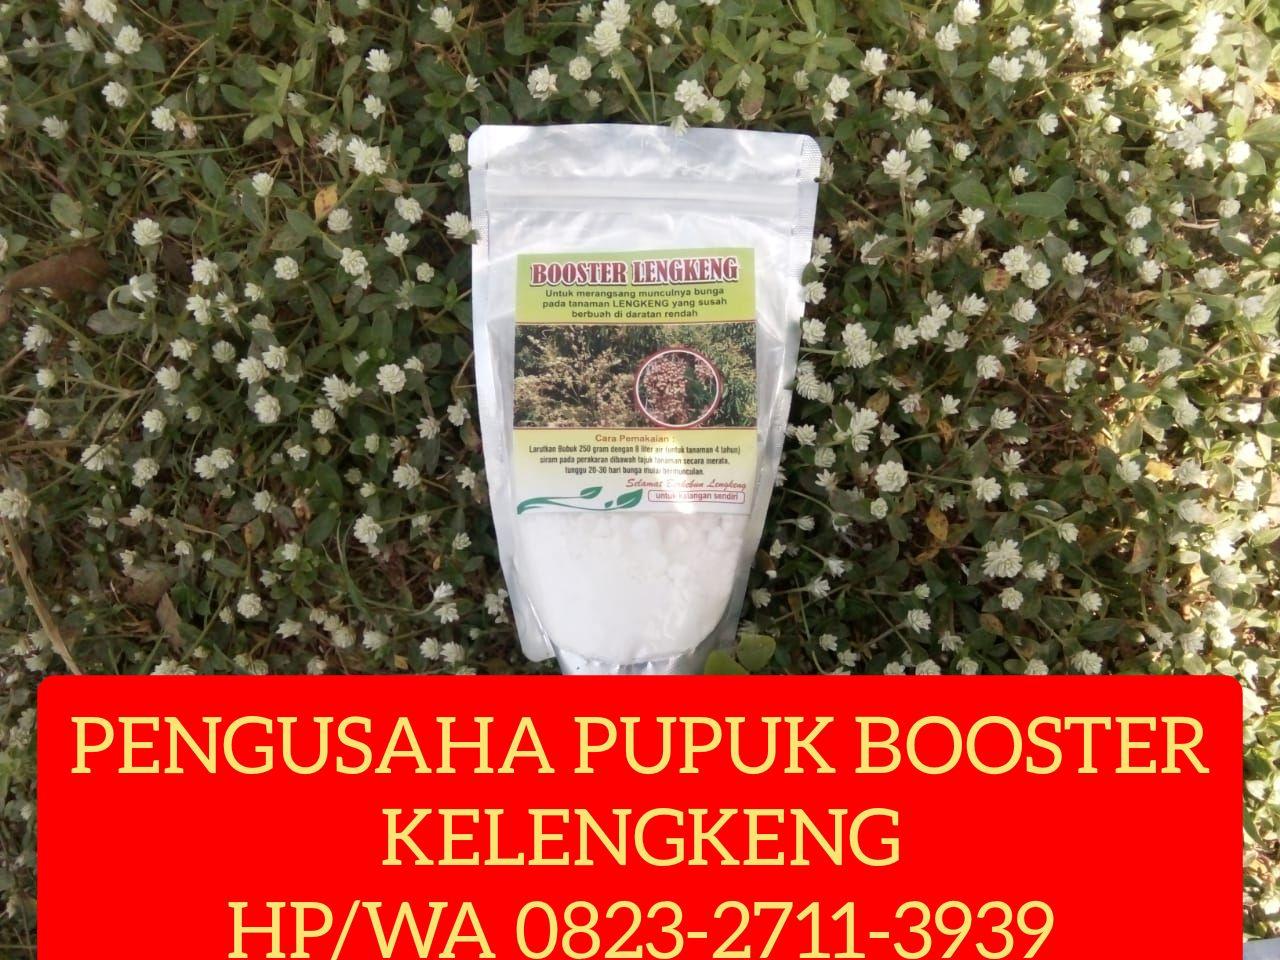 Best Price Hp Wa 0823 2711 3939 Buah Tanaman Aplikasi